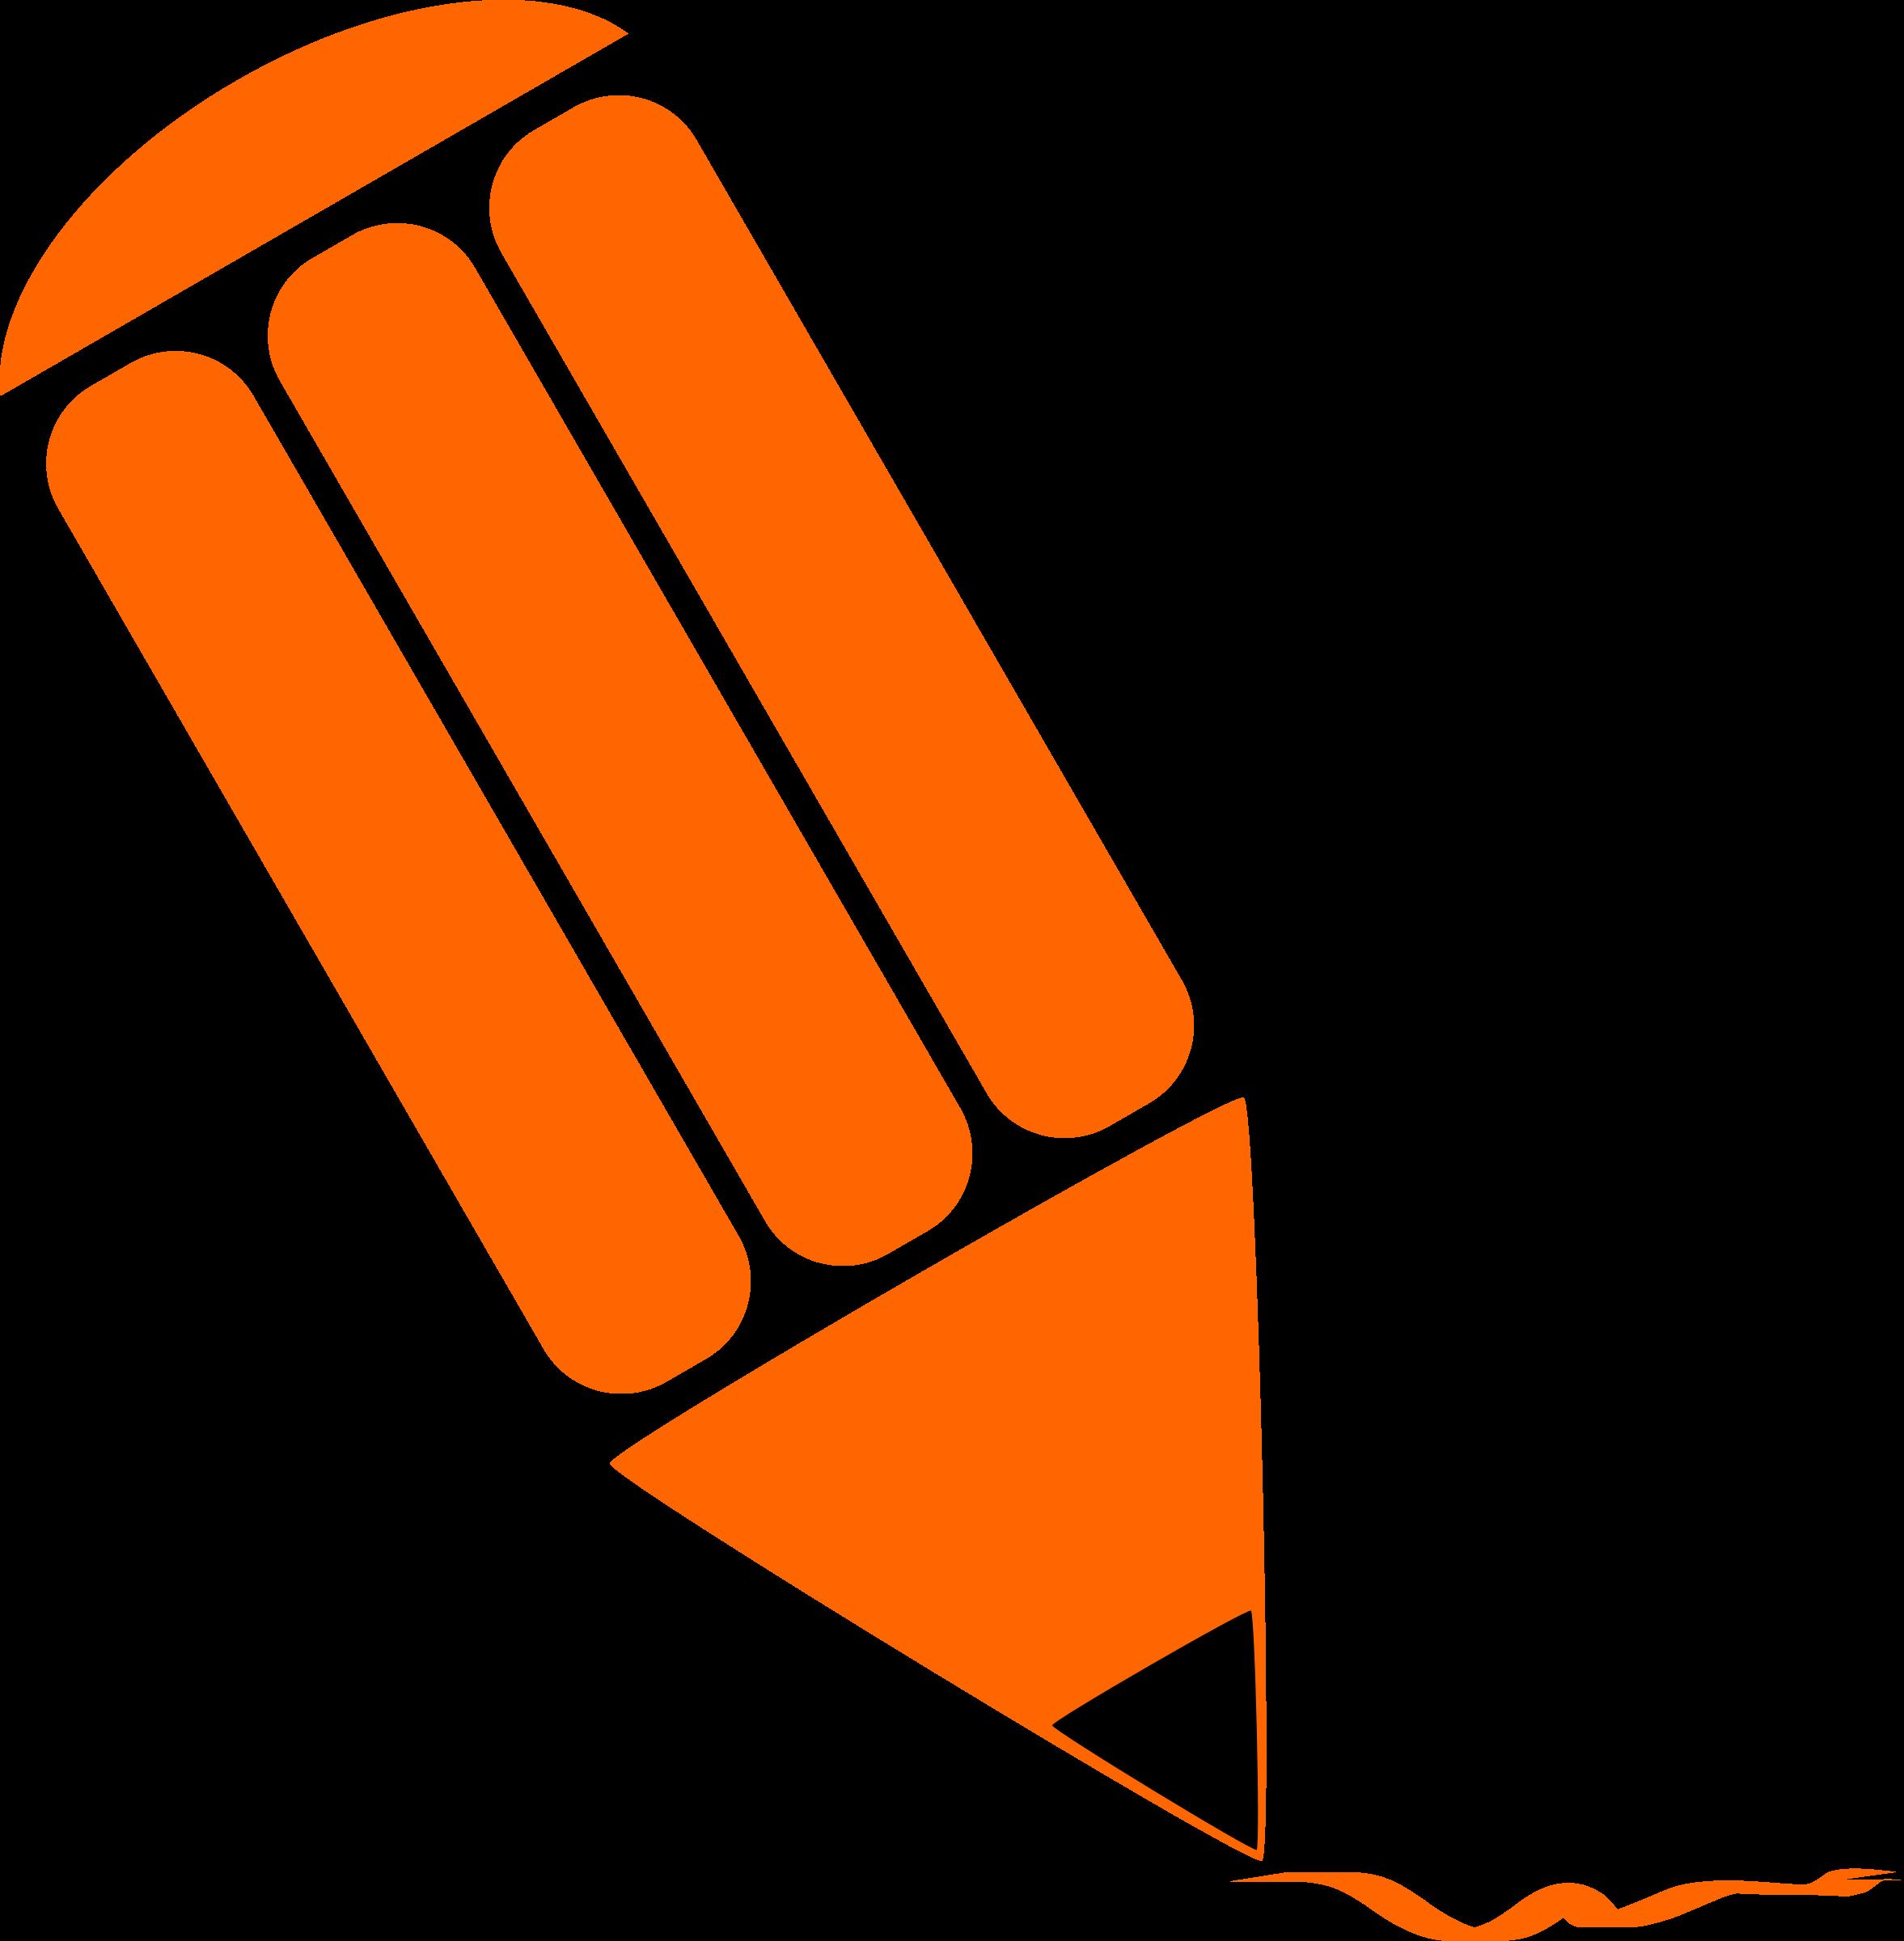 Clipart pencil logo.  collection of orange